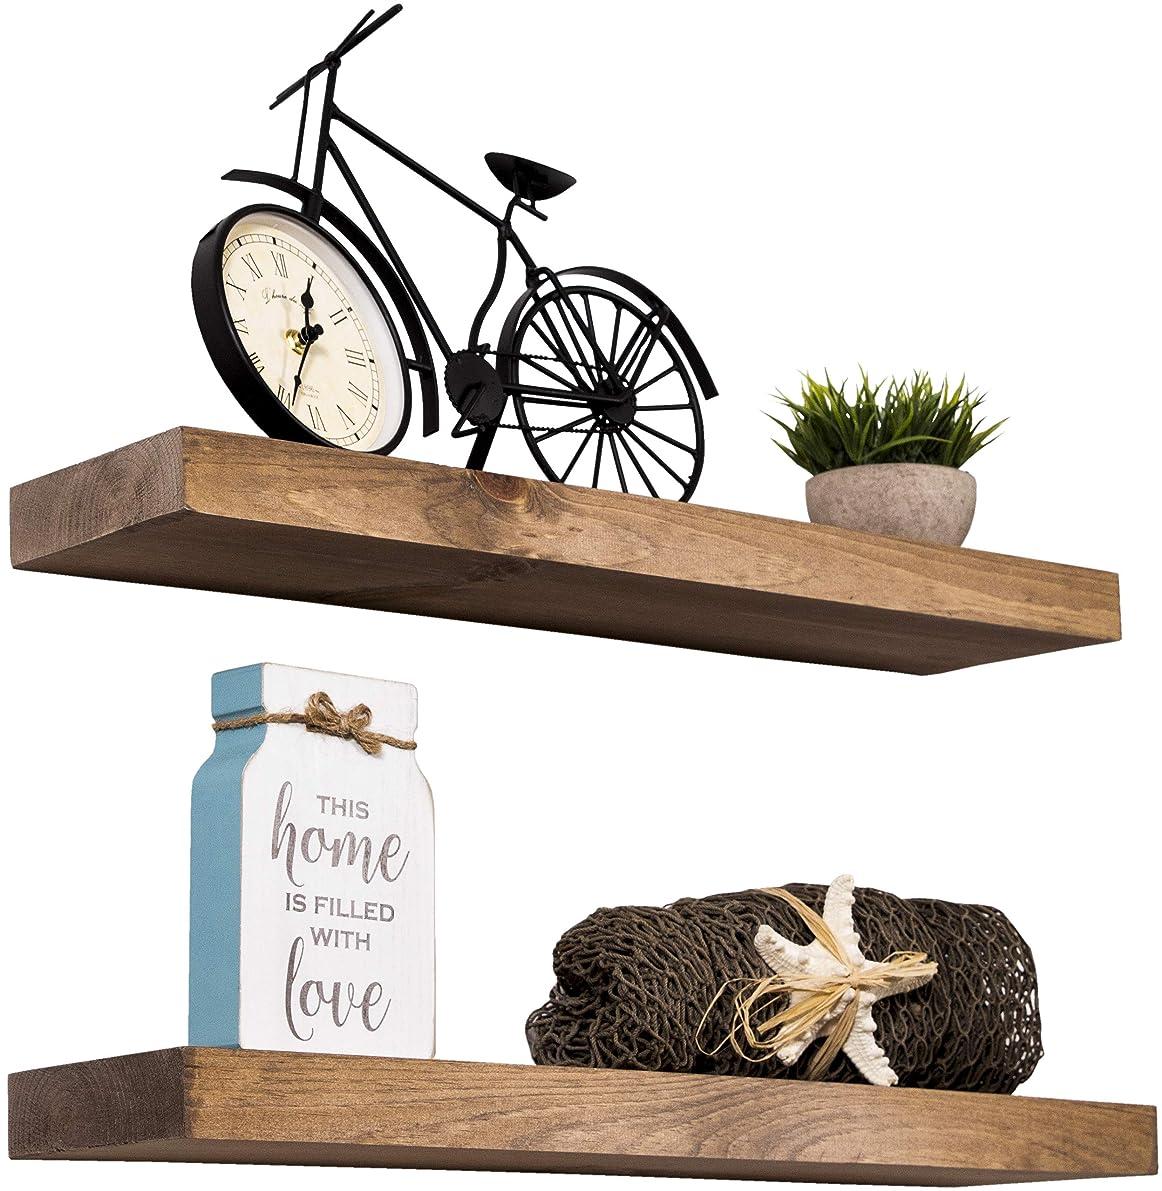 Imperative Décor Floating Shelves Rustic Wood Wall Shelf USA Handmade   Set of 2 (Walnut, 24